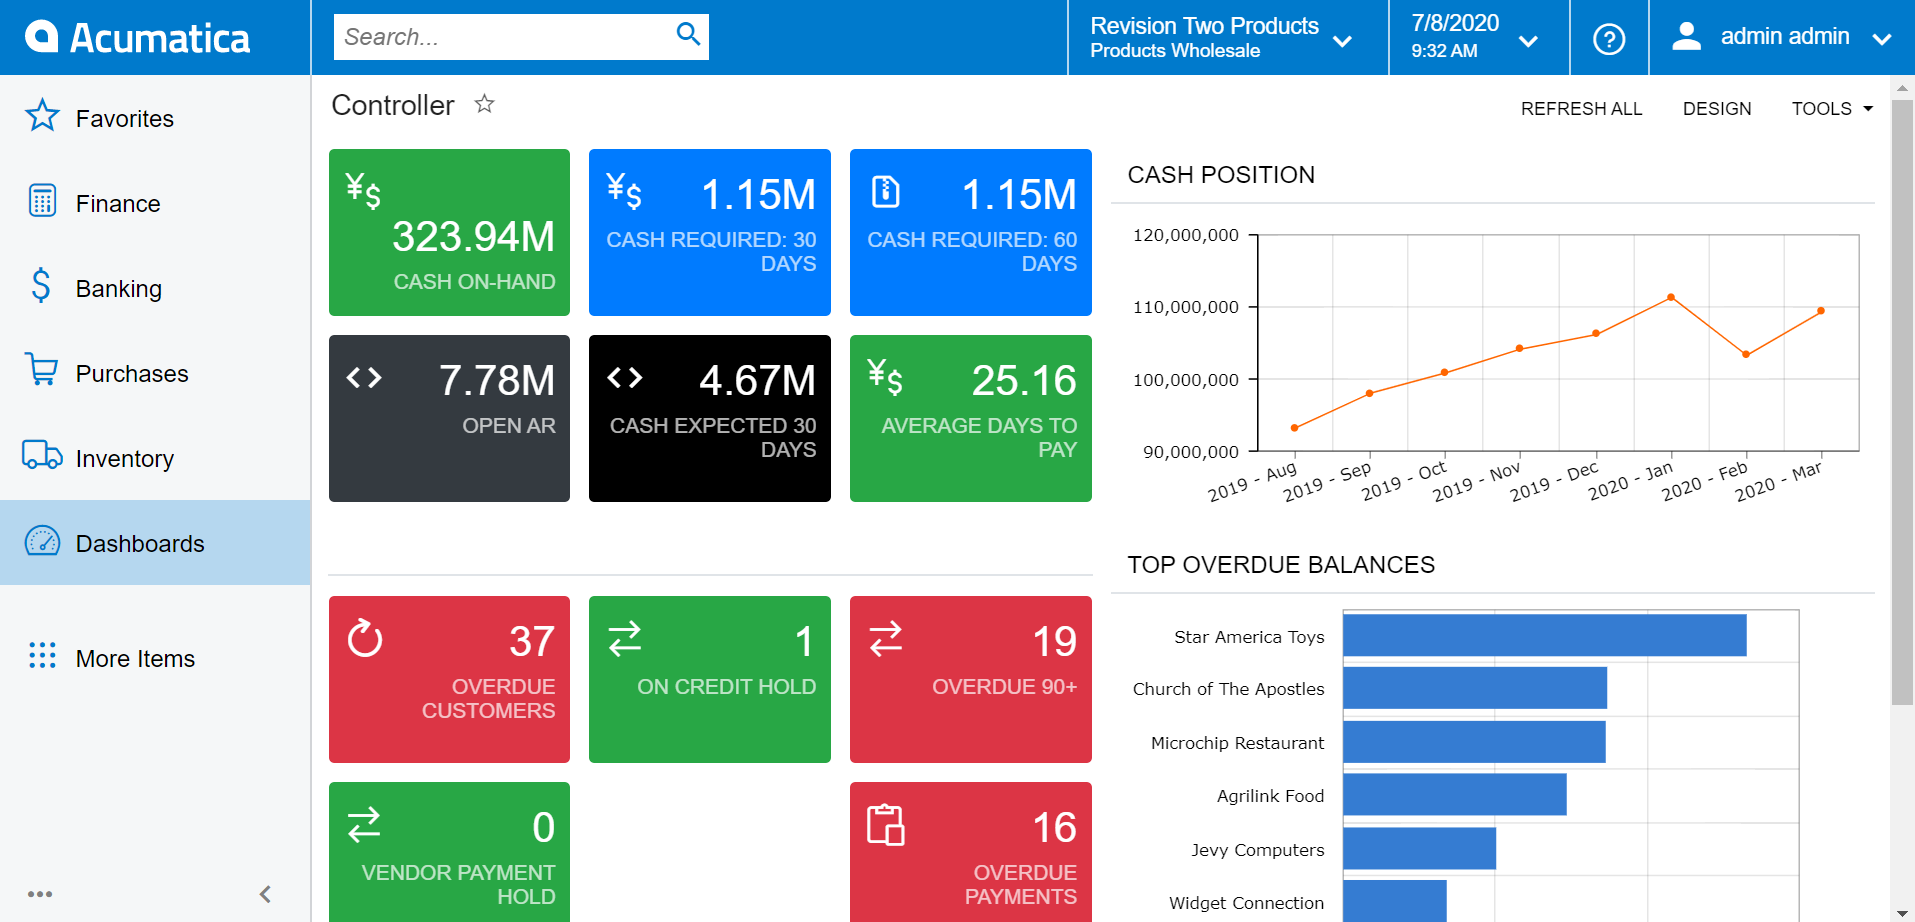 Acumatica Cloud ERP Software - Controller Dashboard: Cash Postion, Balances, Projections